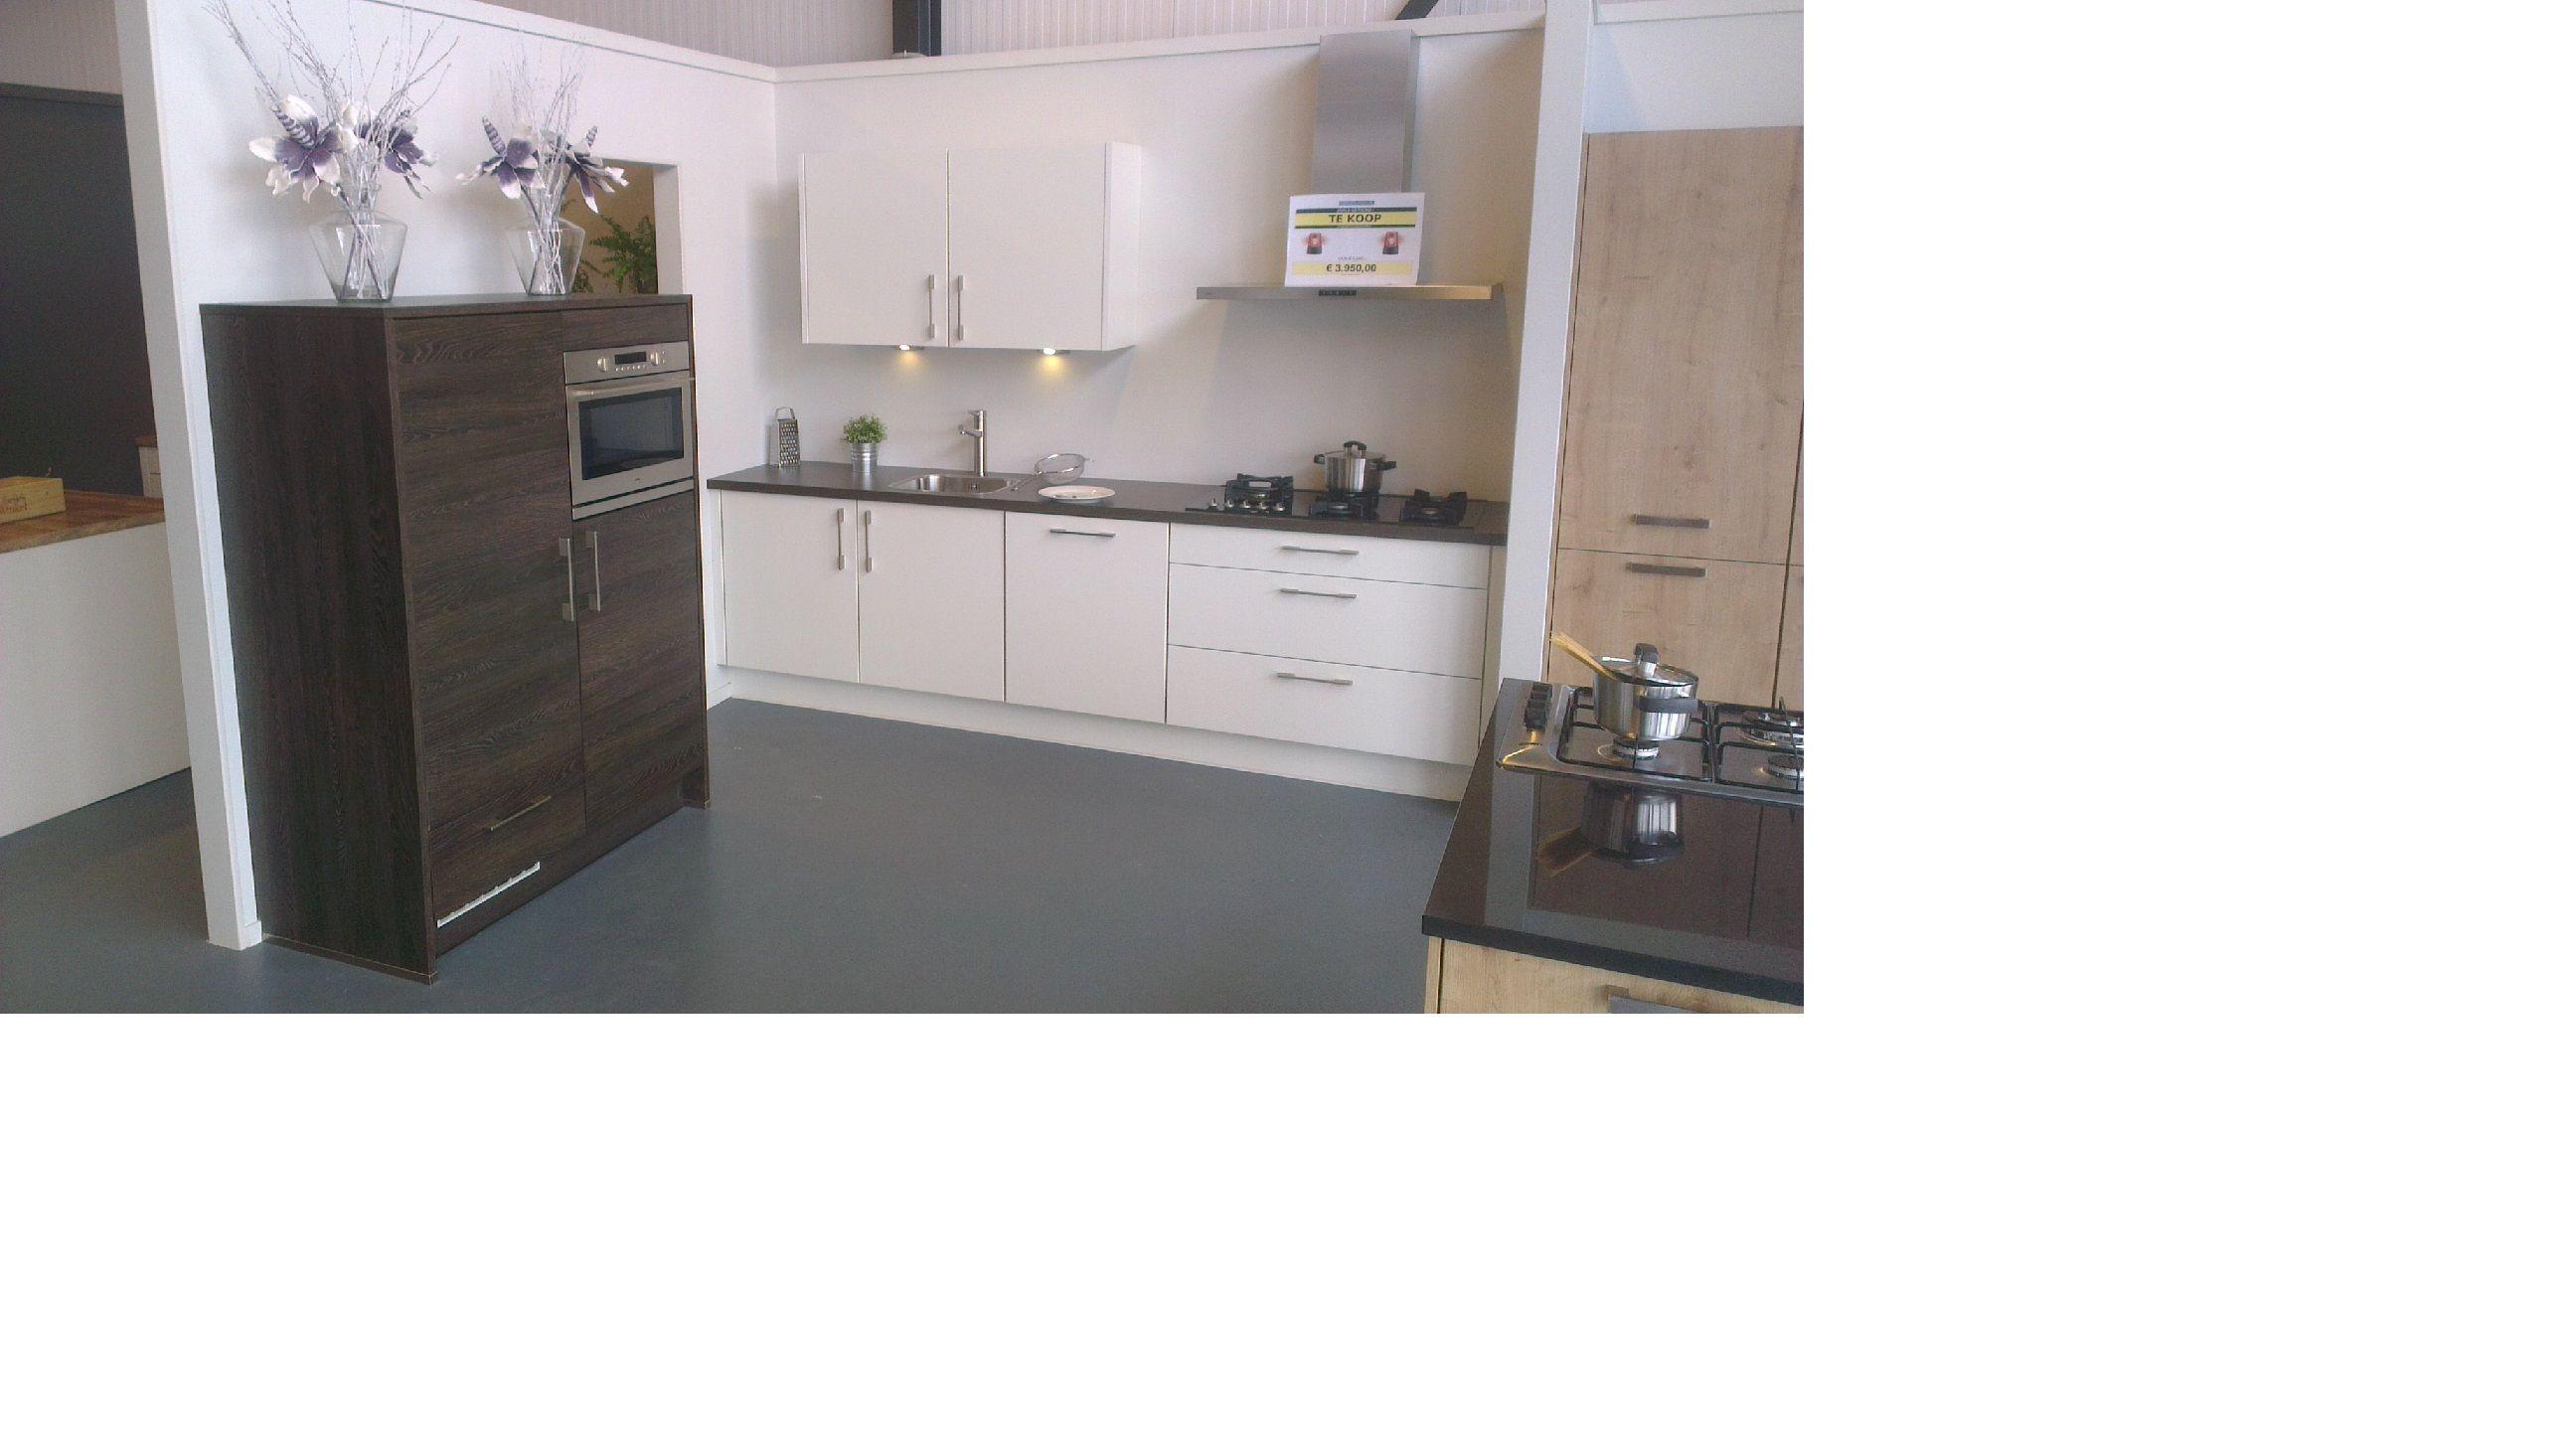 Kastenwand Keuken Te Koop : keuken 6 50335 mat wit gelakte keuken met kastenwand in eiken marron